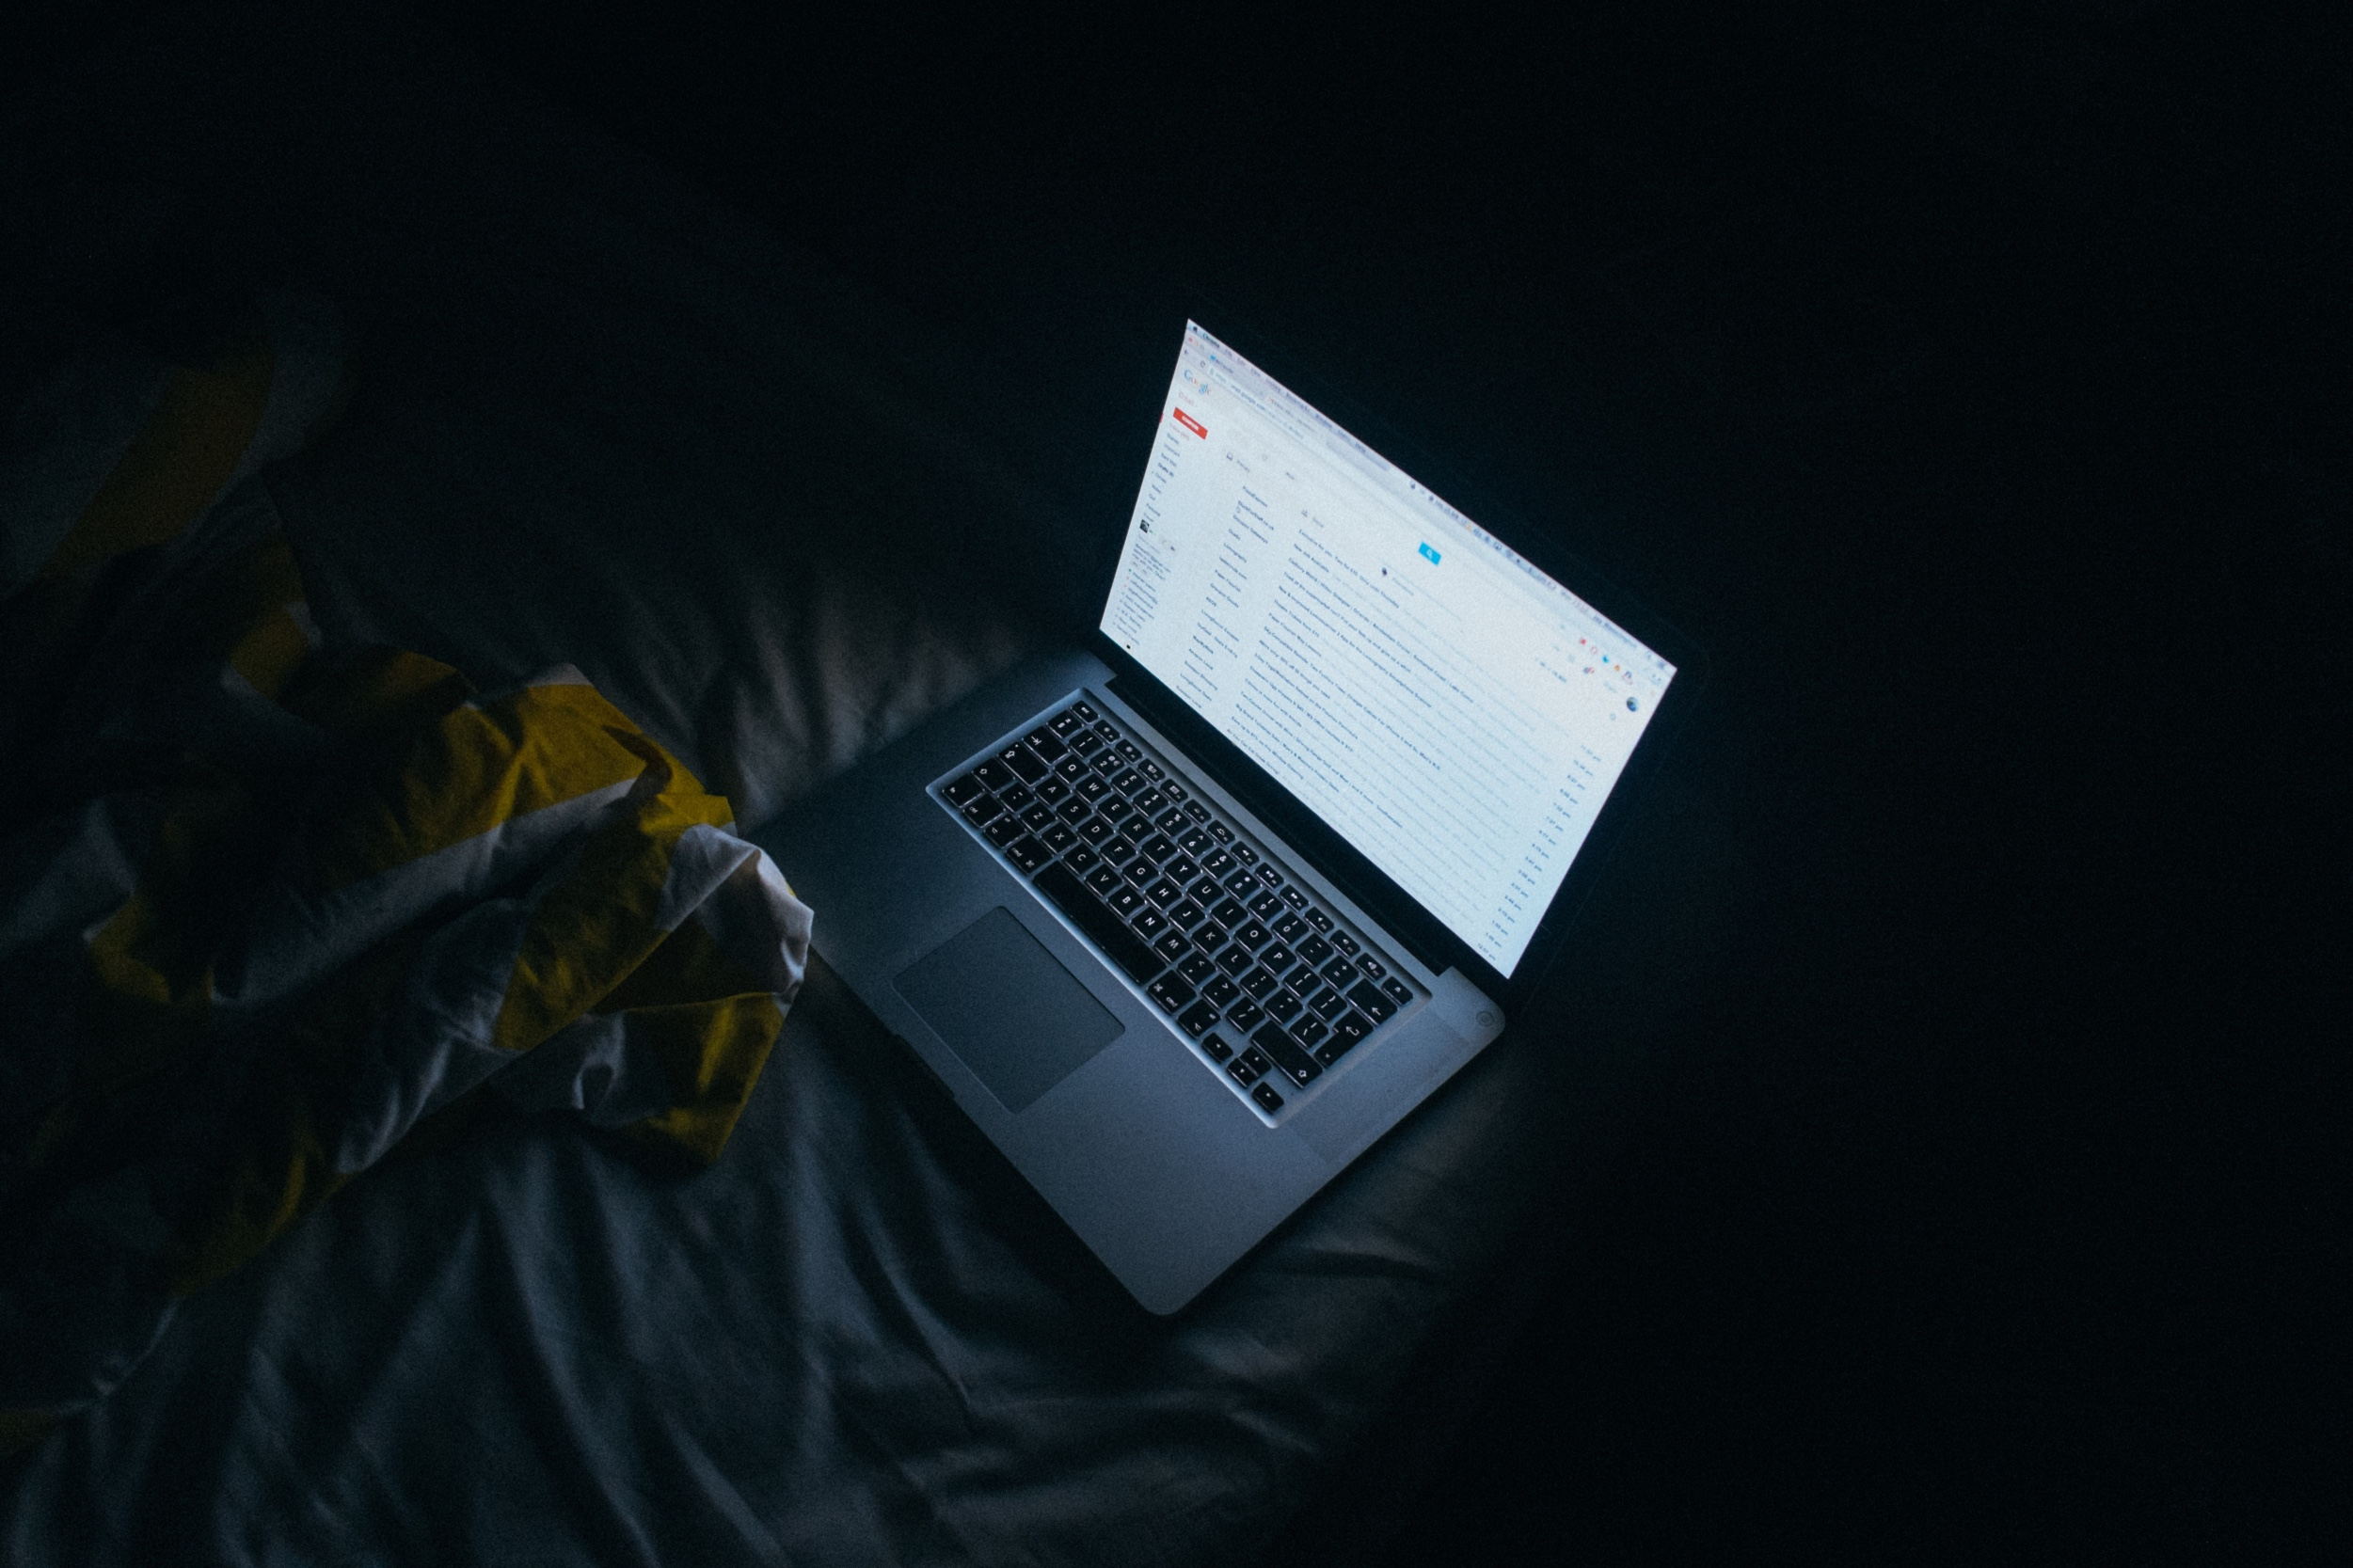 Laptop glare in a dark setting